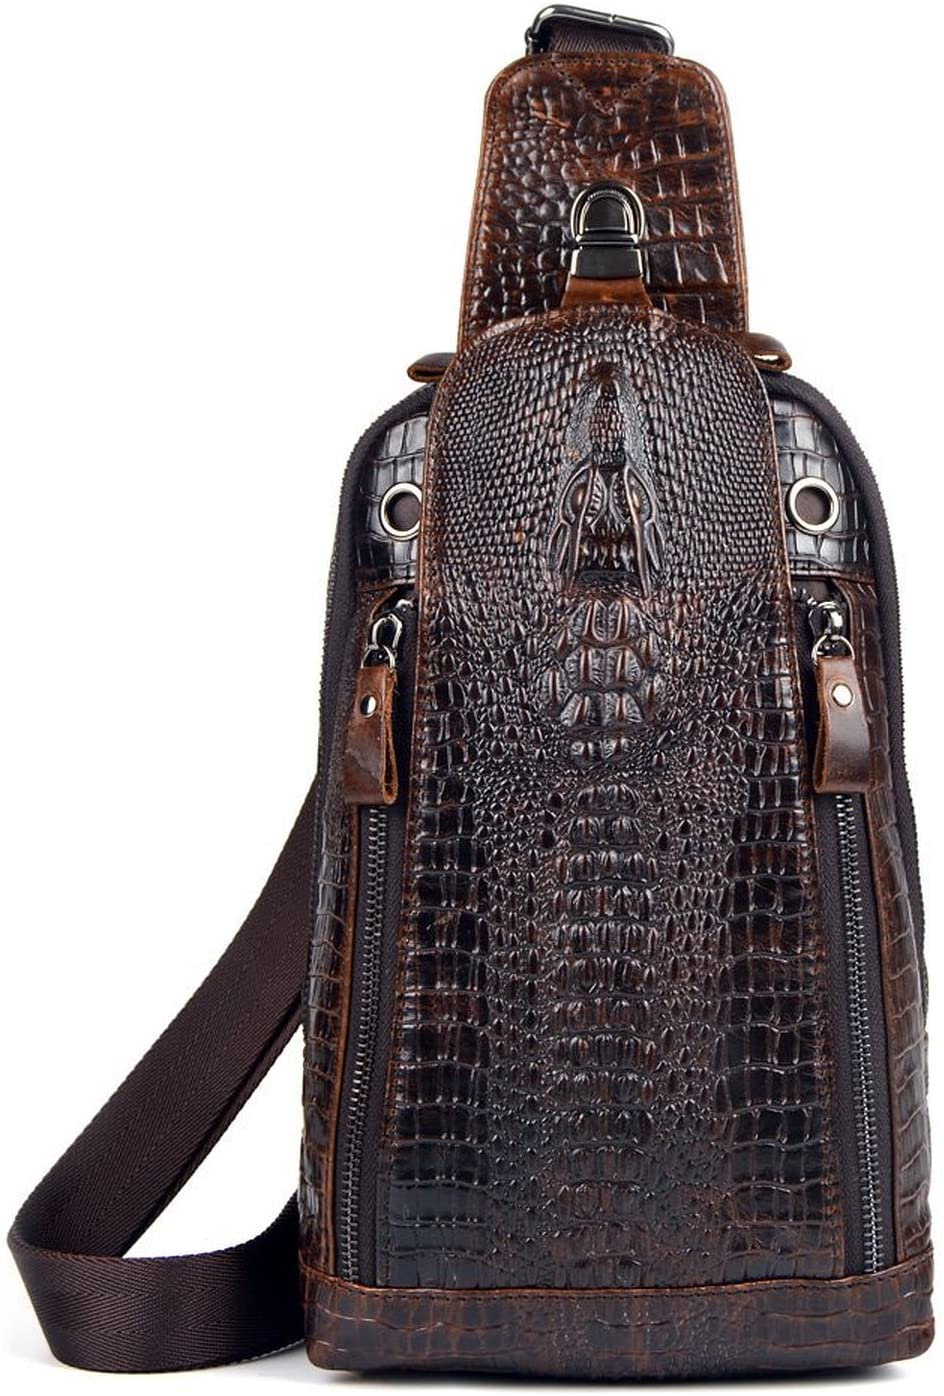 Sunmig Men's Crocodile Genuine Leather Crossbody Chest Bag Hiking Sling Daypack